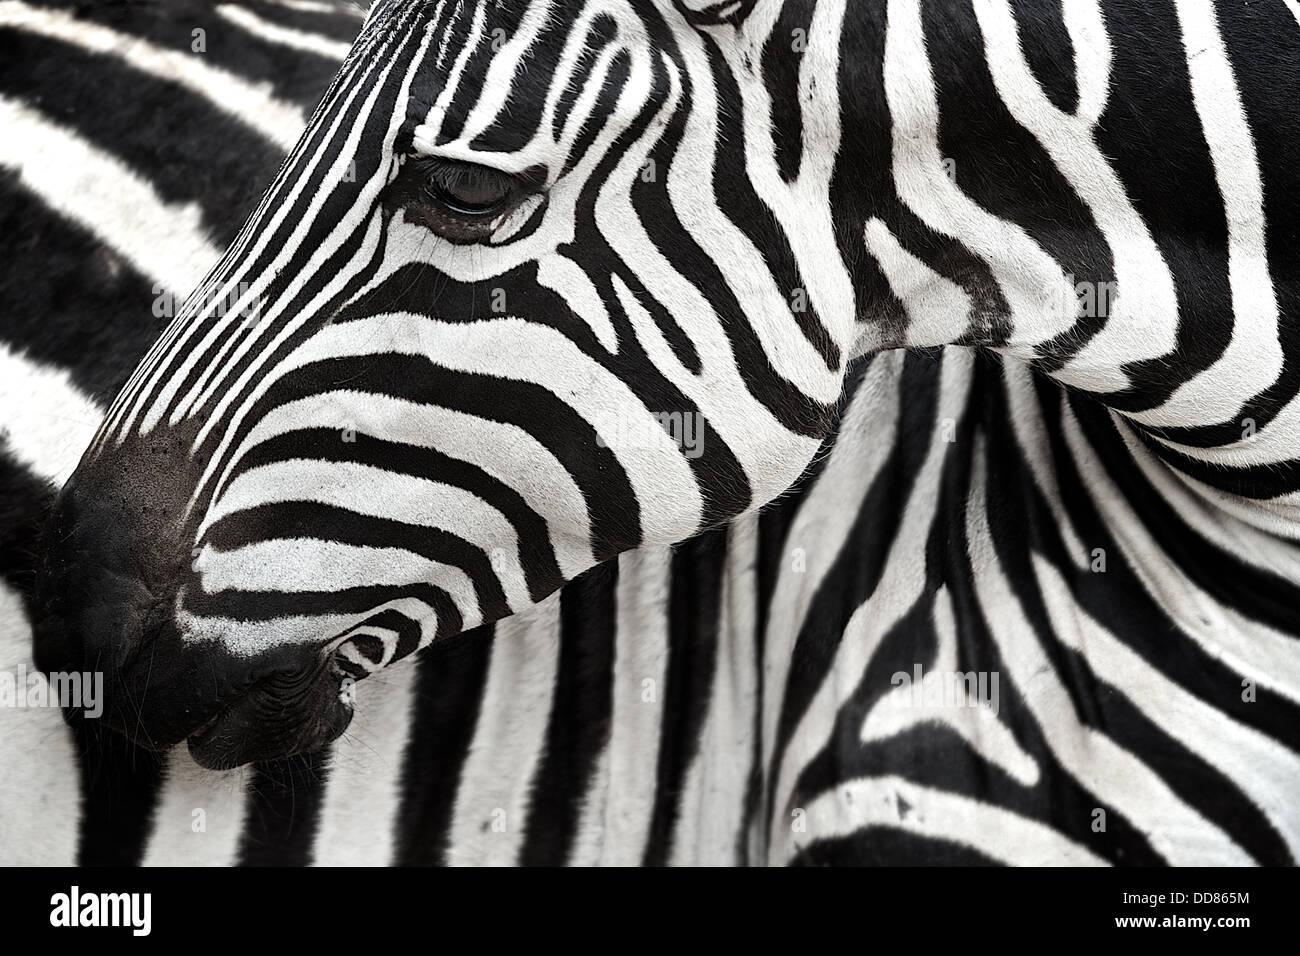 Zebra tourne à zéro son corps. Serengeti . La Tanzanie . Afrique du Sud Photo Stock